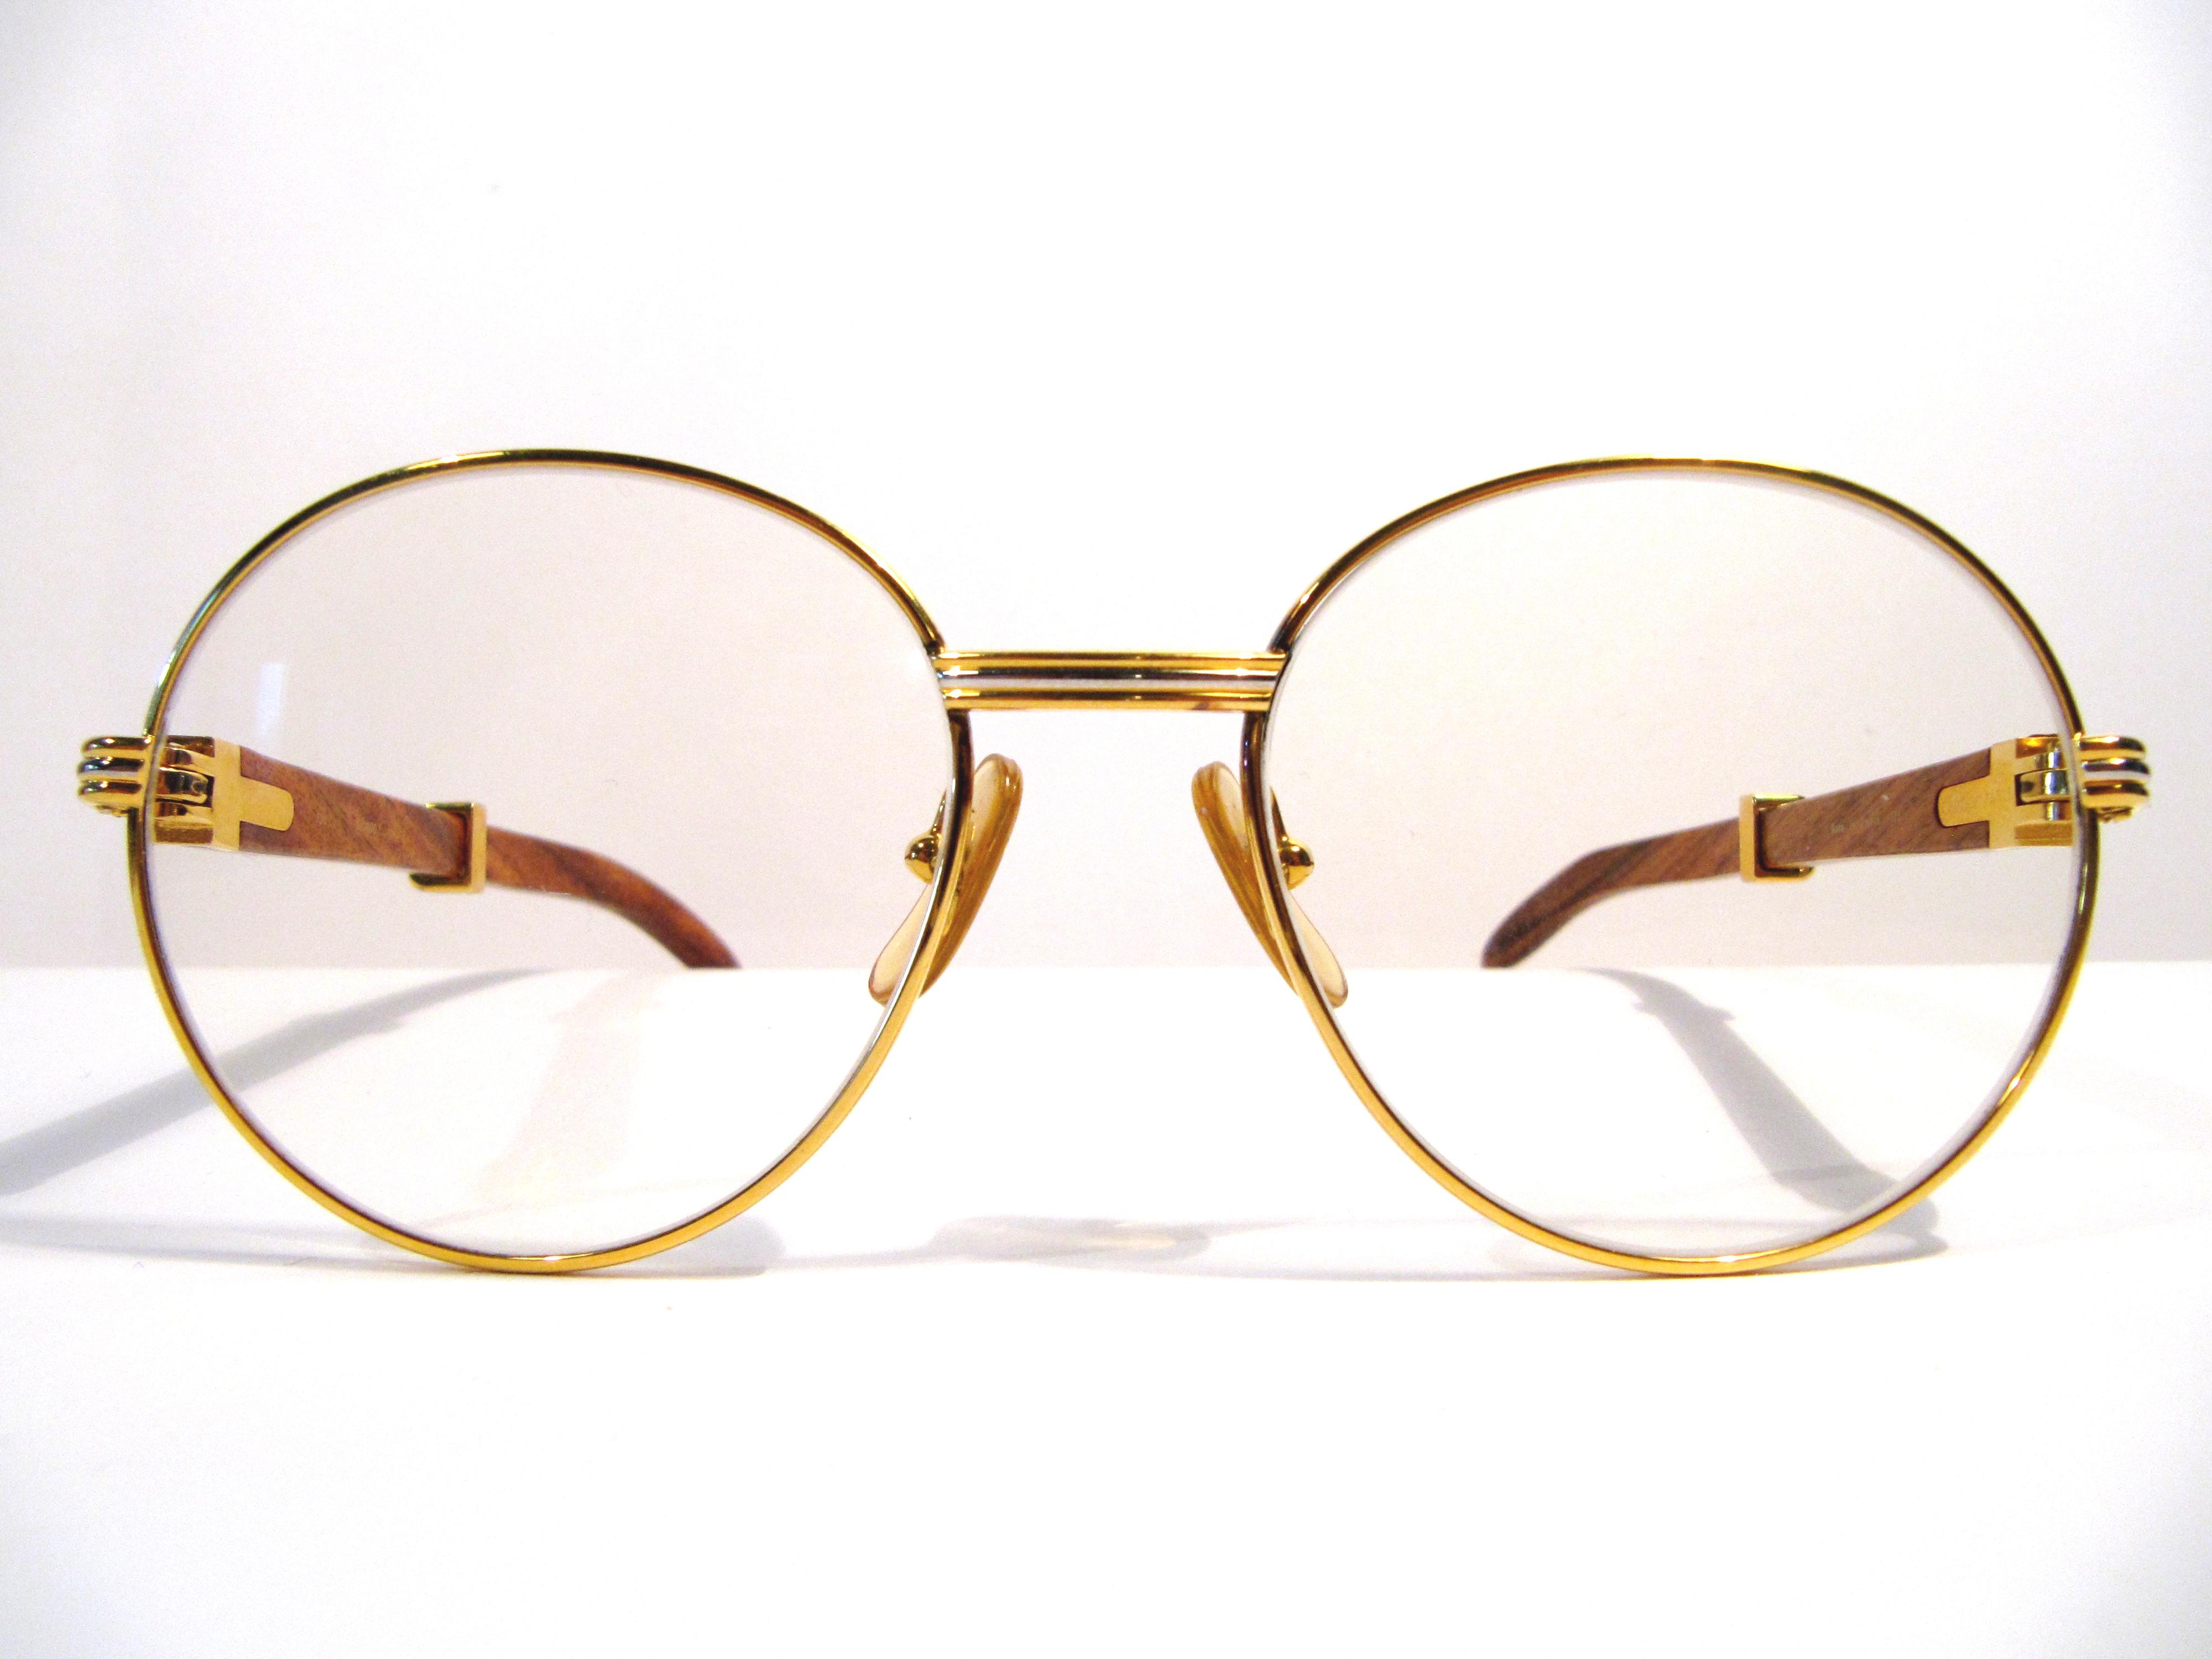 vintage cartier glasses global business forum iitbaa